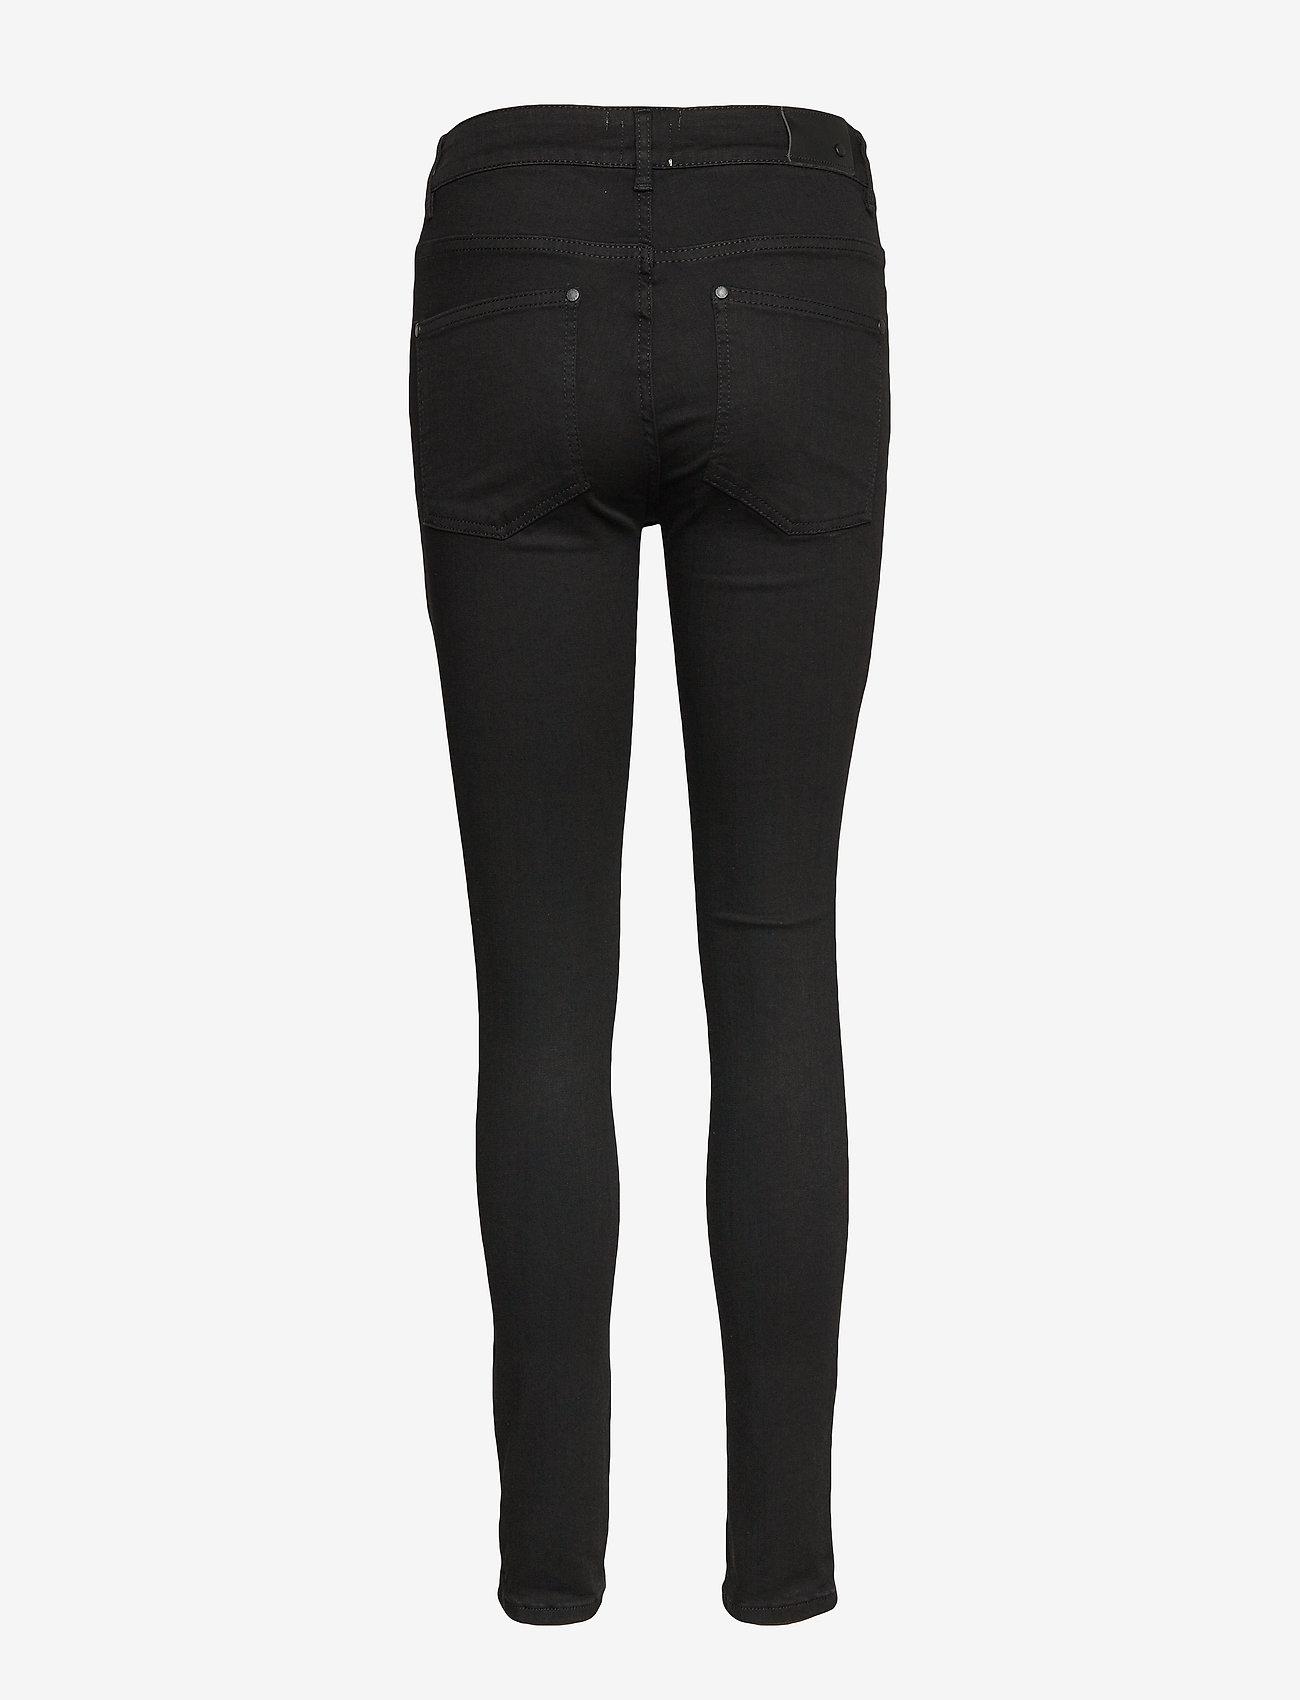 Twist & Tango - Julie Jeans Black - skinny jeans - black - 1